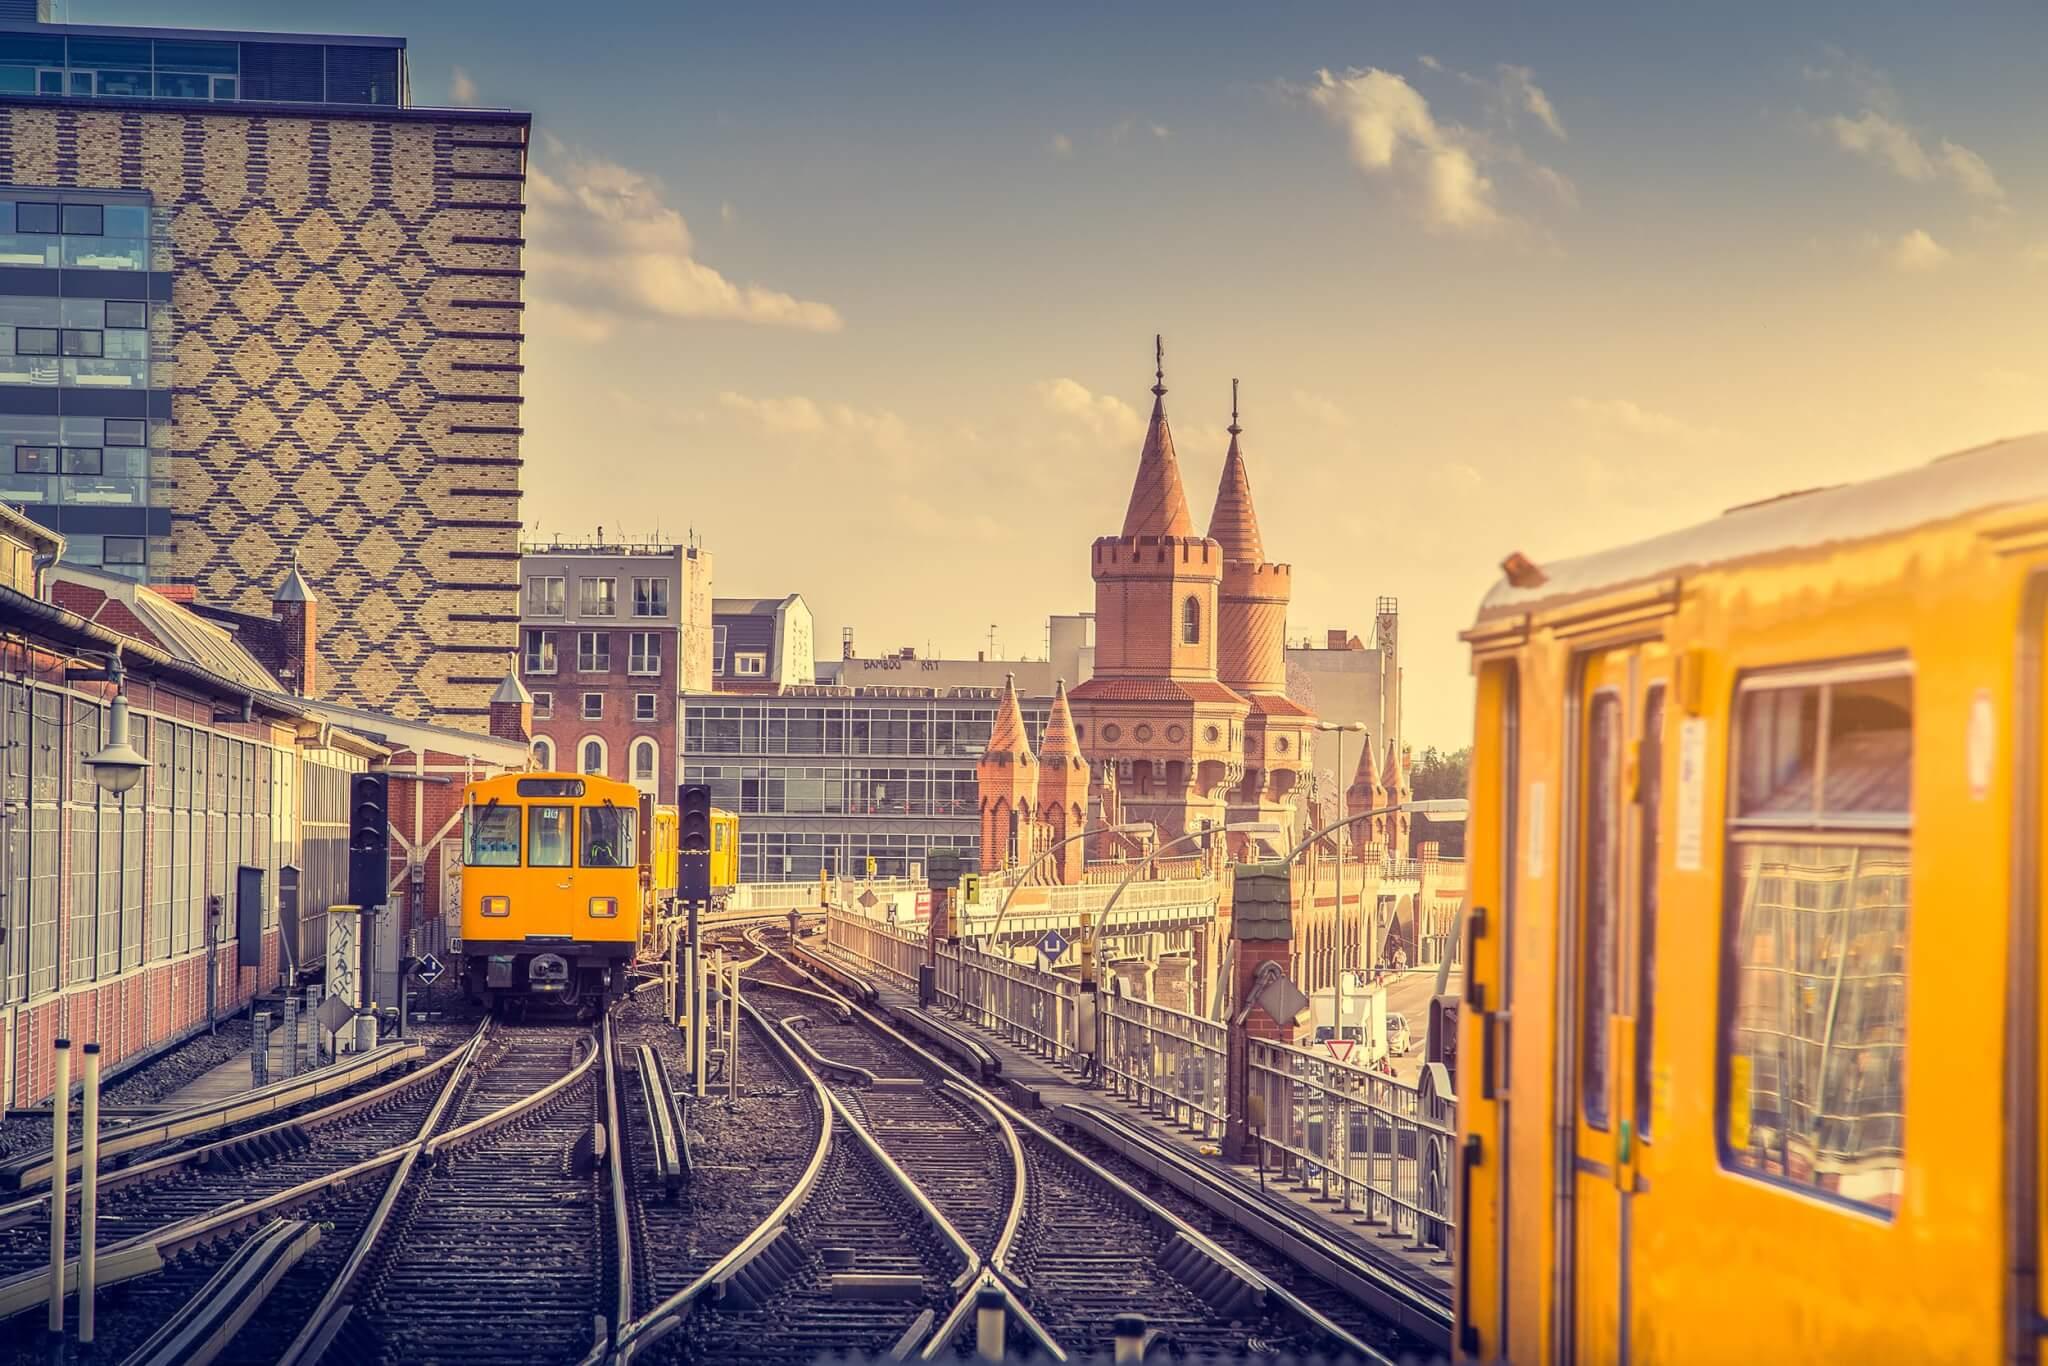 https://travelicious.bold-themes.com/main-demo/wp-content/uploads/sites/2/2018/09/destination-berlin-08.jpg